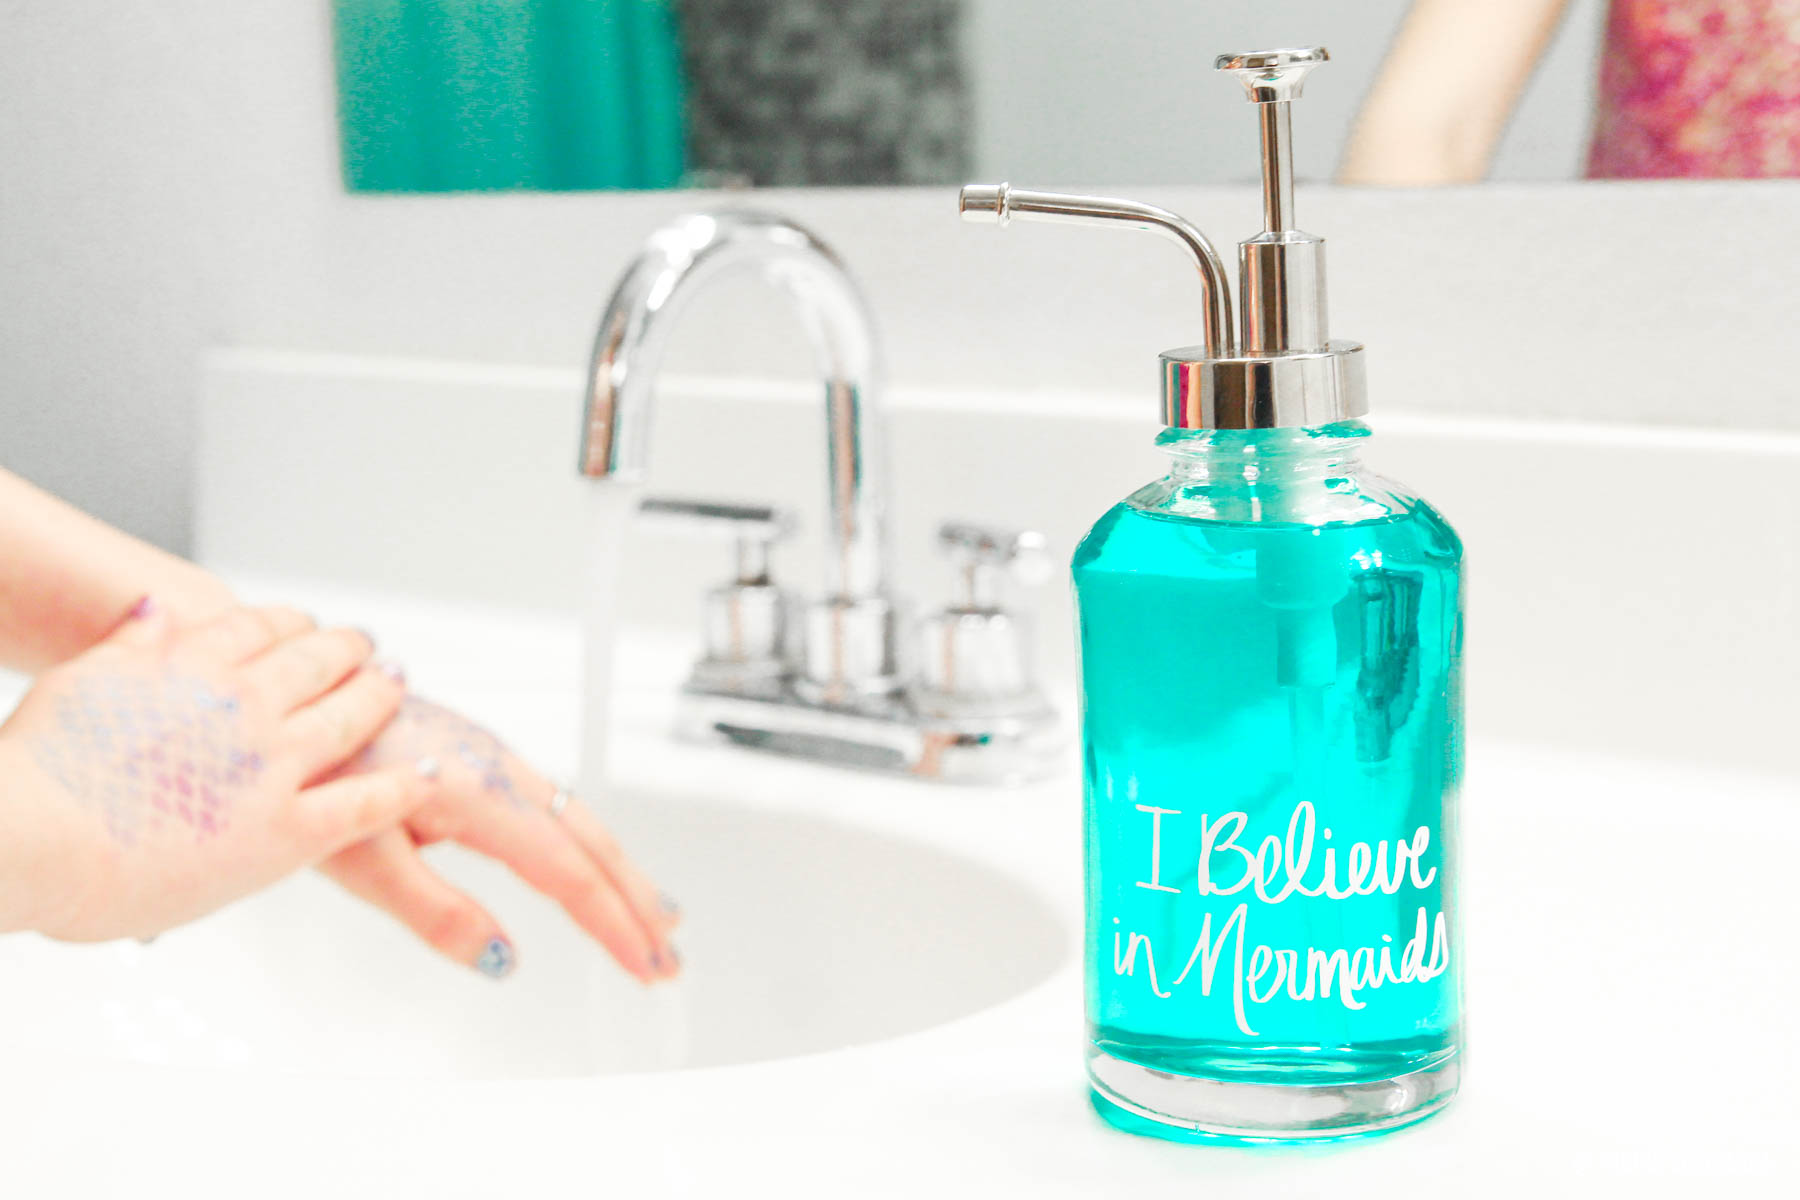 Mermaids Bathroom Decor ideas. See how to make this easy DIY Mermaid Soap Dispenser via @PagingSupermom